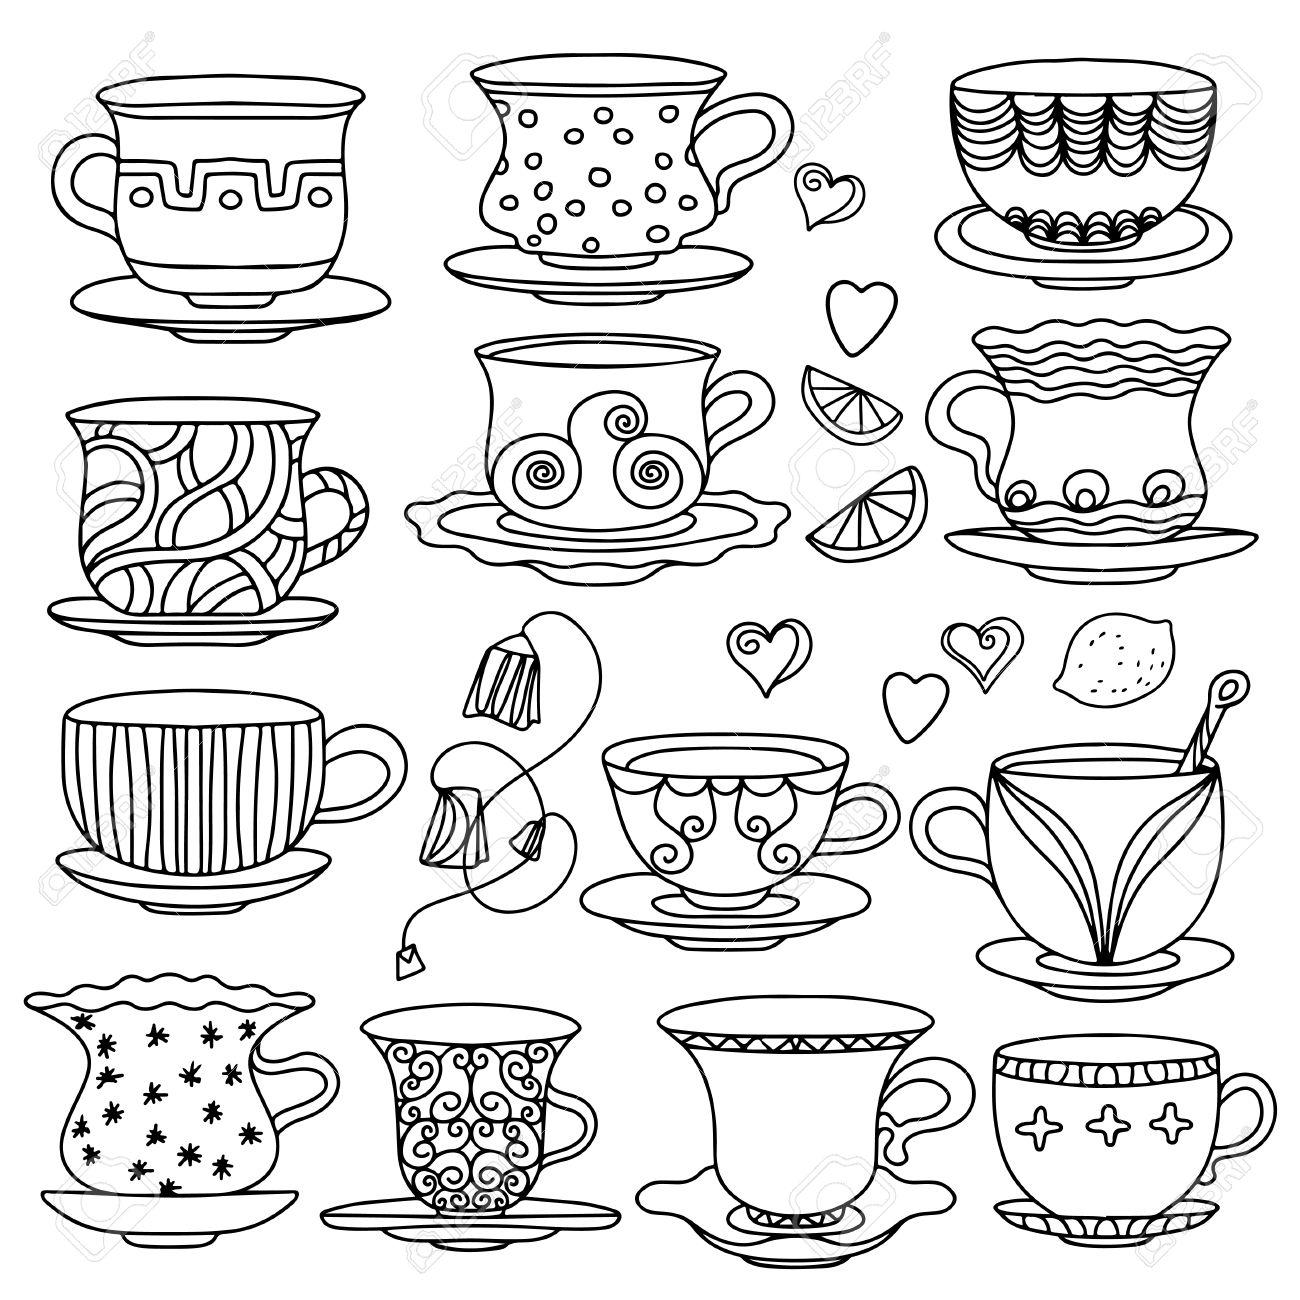 1300x1300 Set Vintage Icons Tea Cup, Lemons, Hearts, And Tea Bags